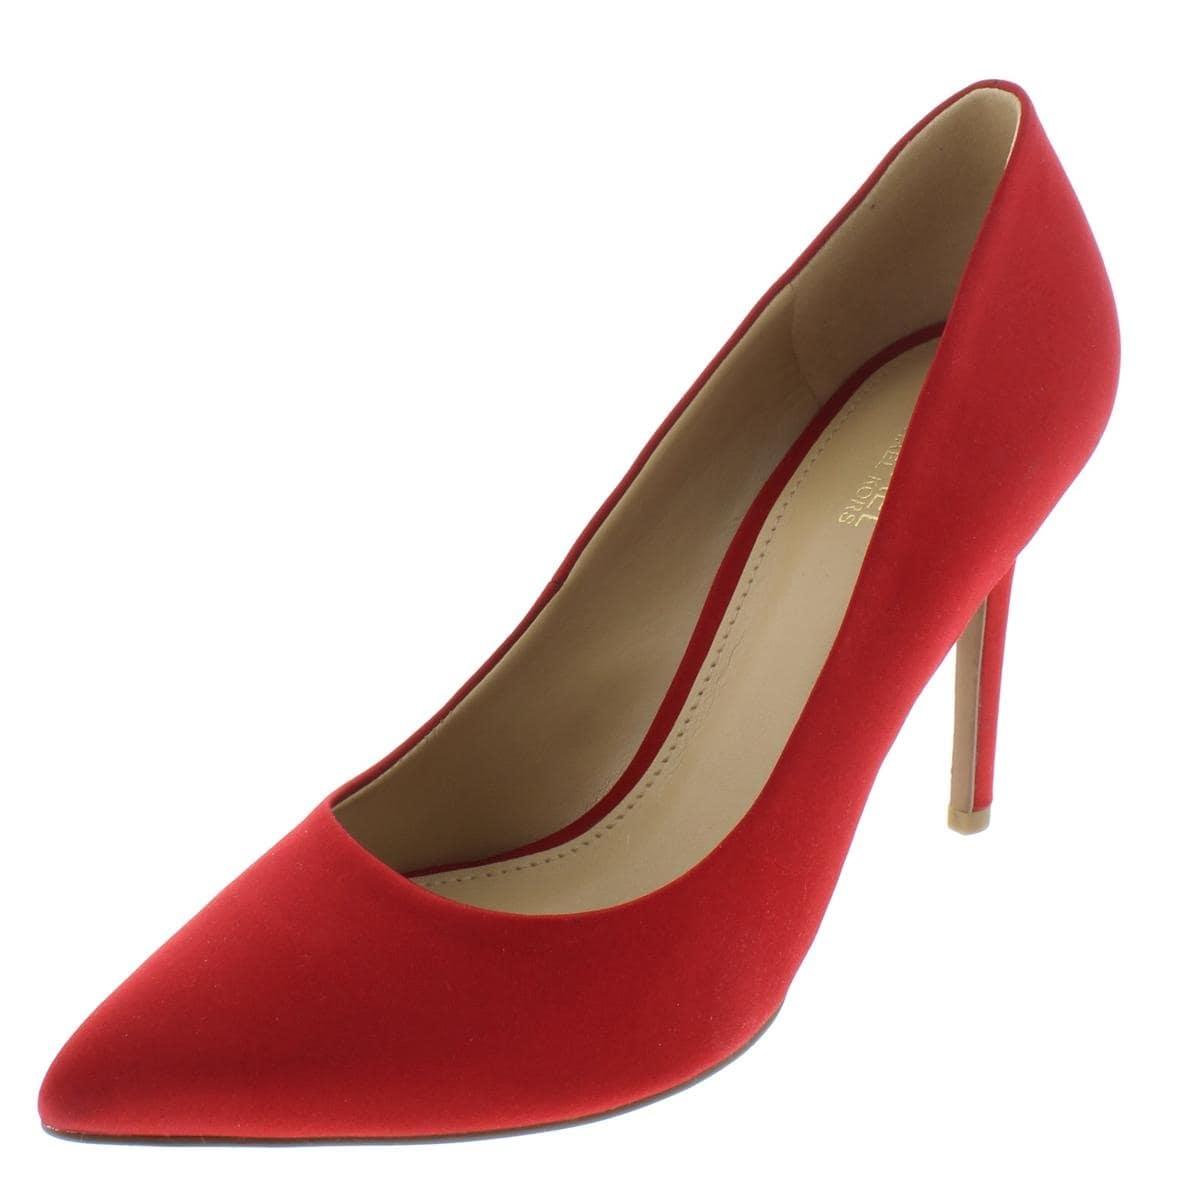 6bd4960d1d576 Shop MICHAEL Michael Kors Womens Claire Evening Heels Satin Almond ...